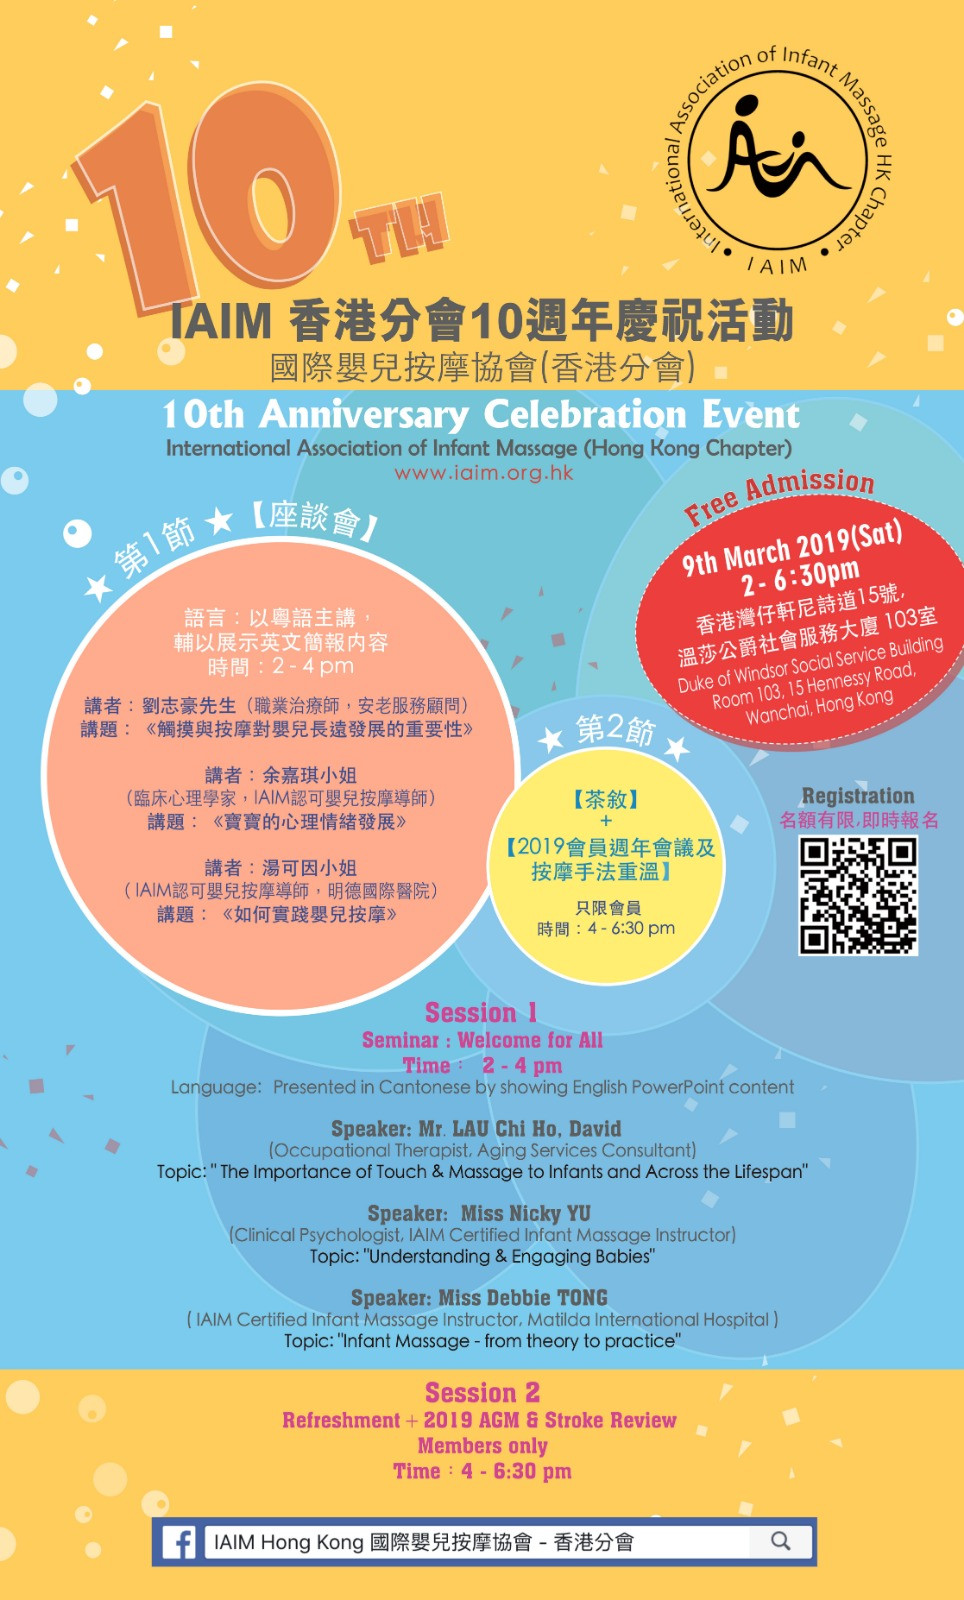 10th anniversary of the establishment of IAIM (HK Chapter)